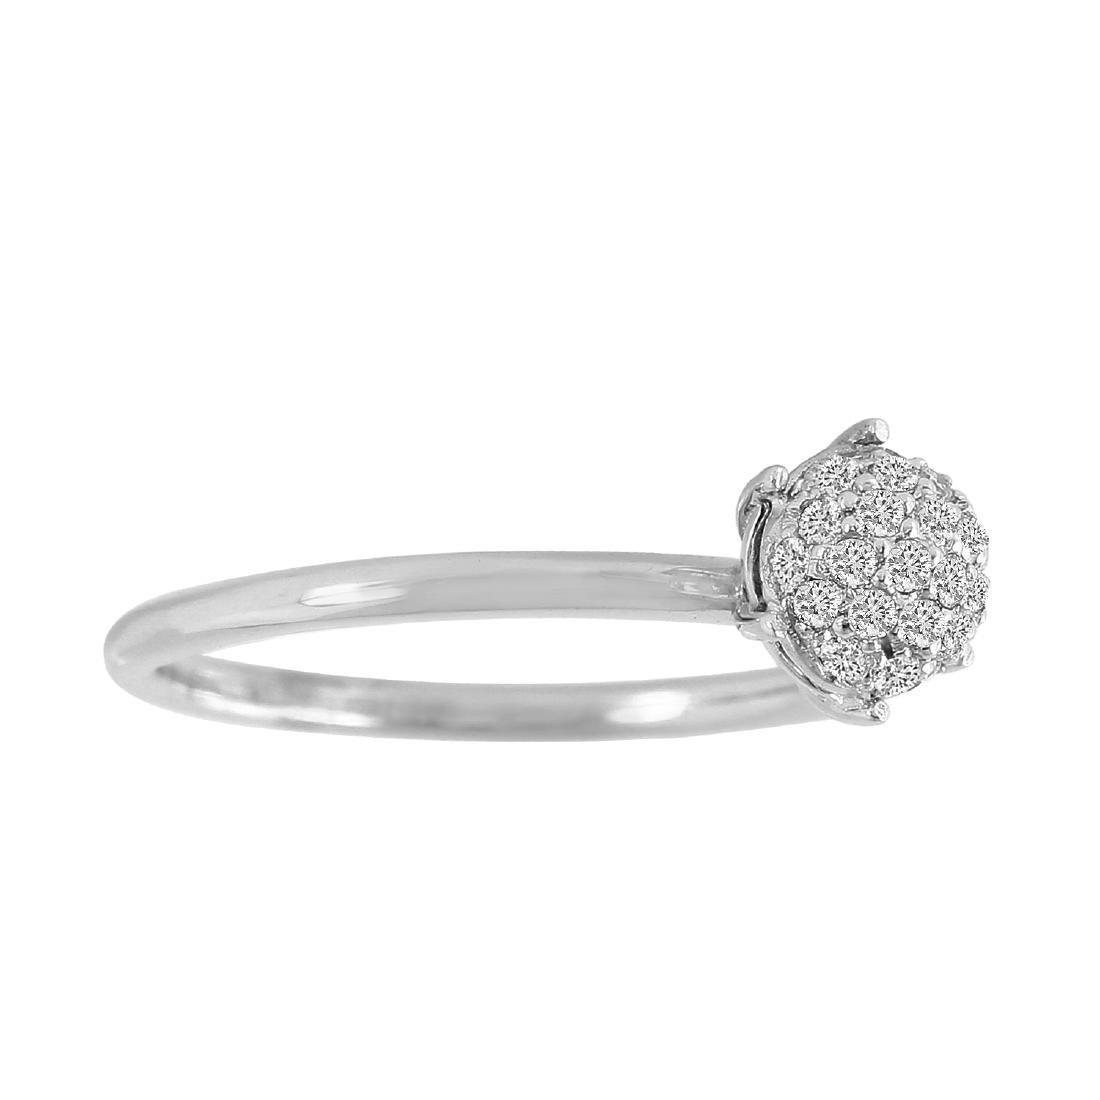 0.19 Carat Natural Diamond 18K Solid White Gold Ring - 2